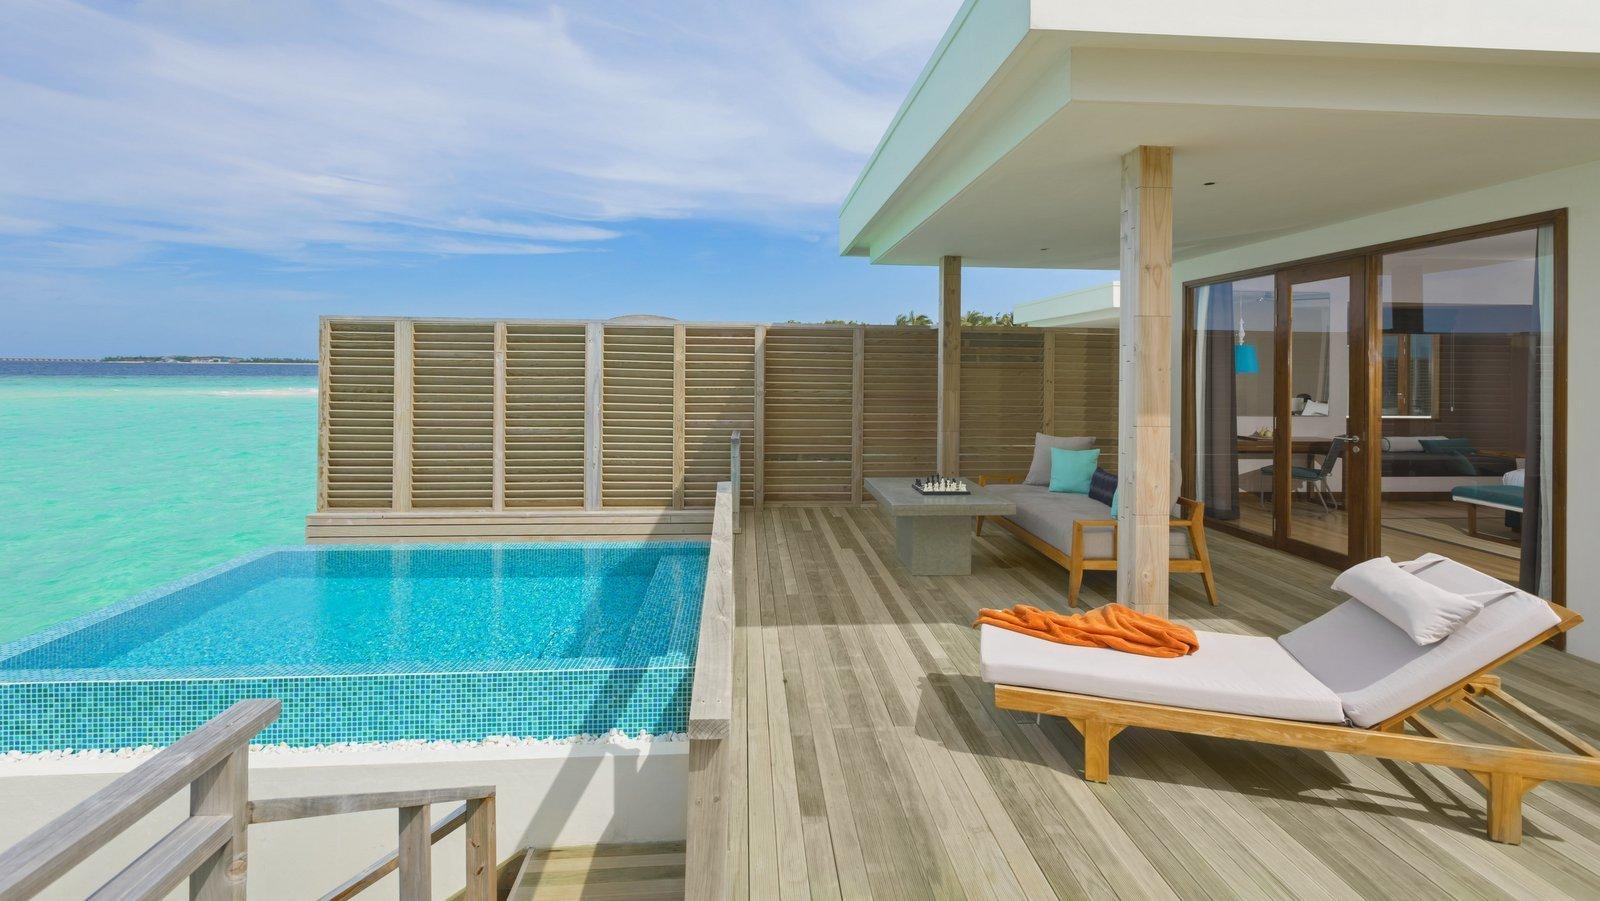 Мальдивы, отель Dhigali Maldives, номер Lagoon Villa with Pool